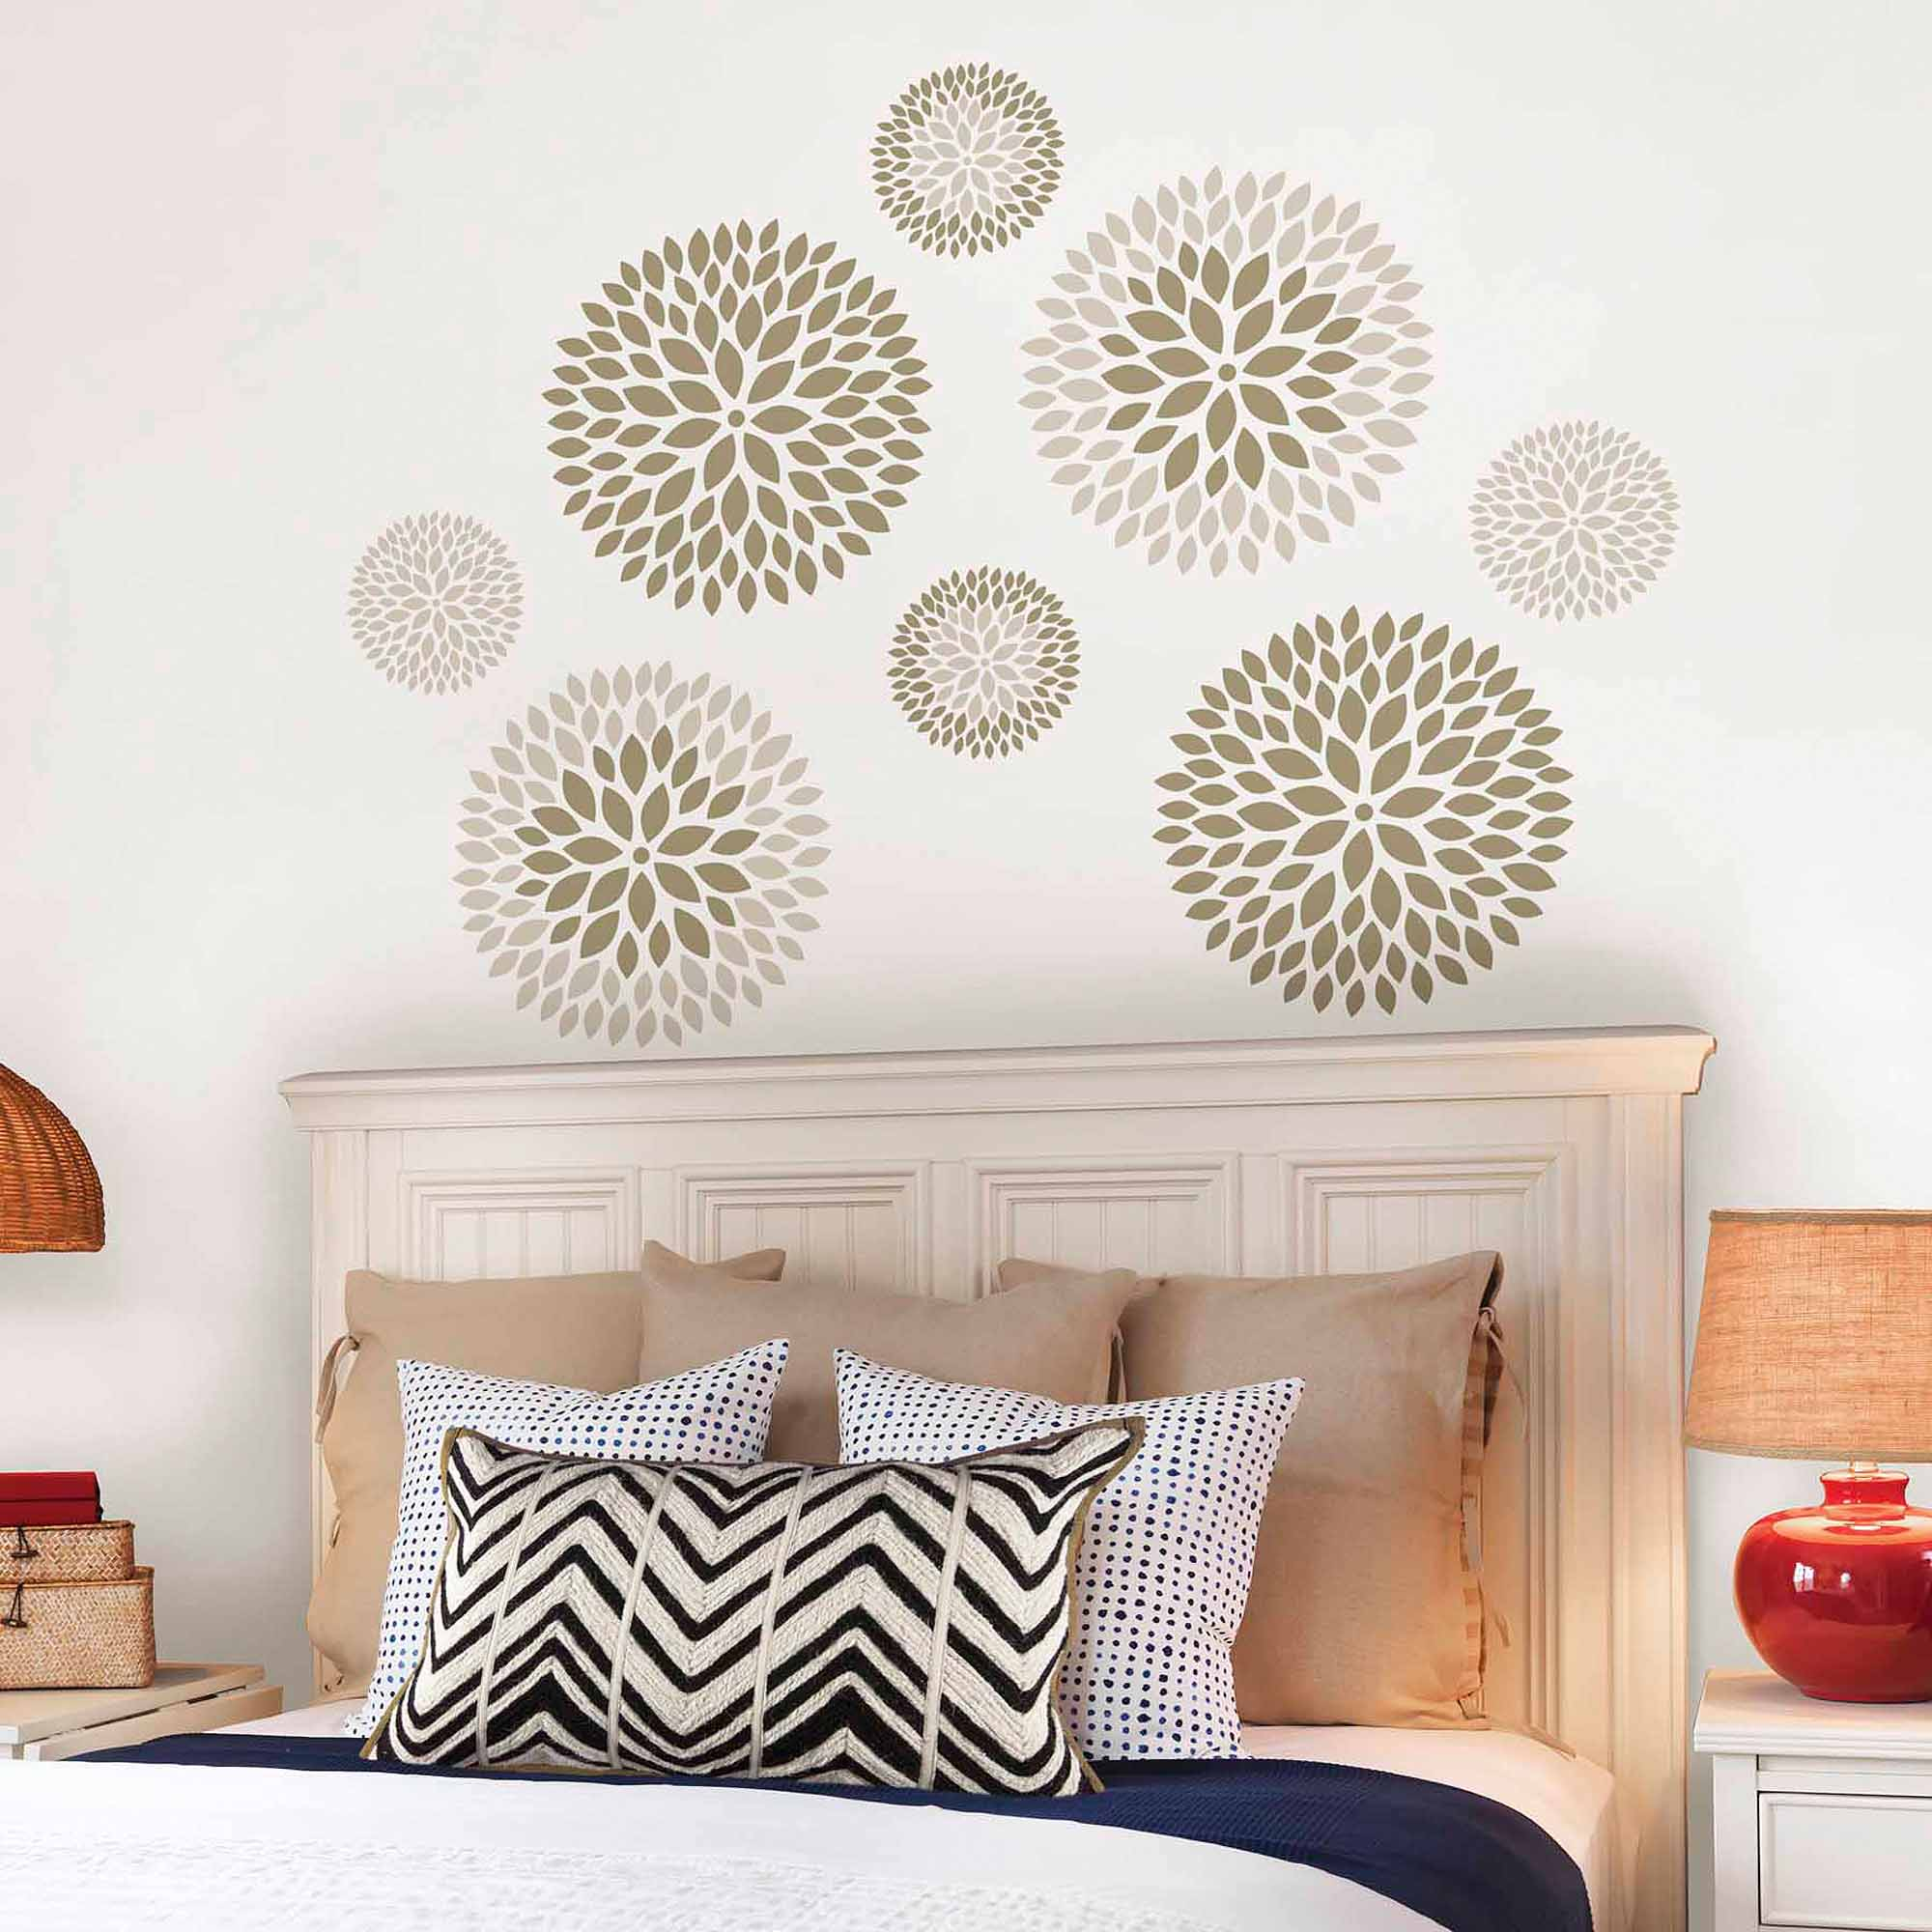 wallpops chrysanthemum wall art decals kit walmart